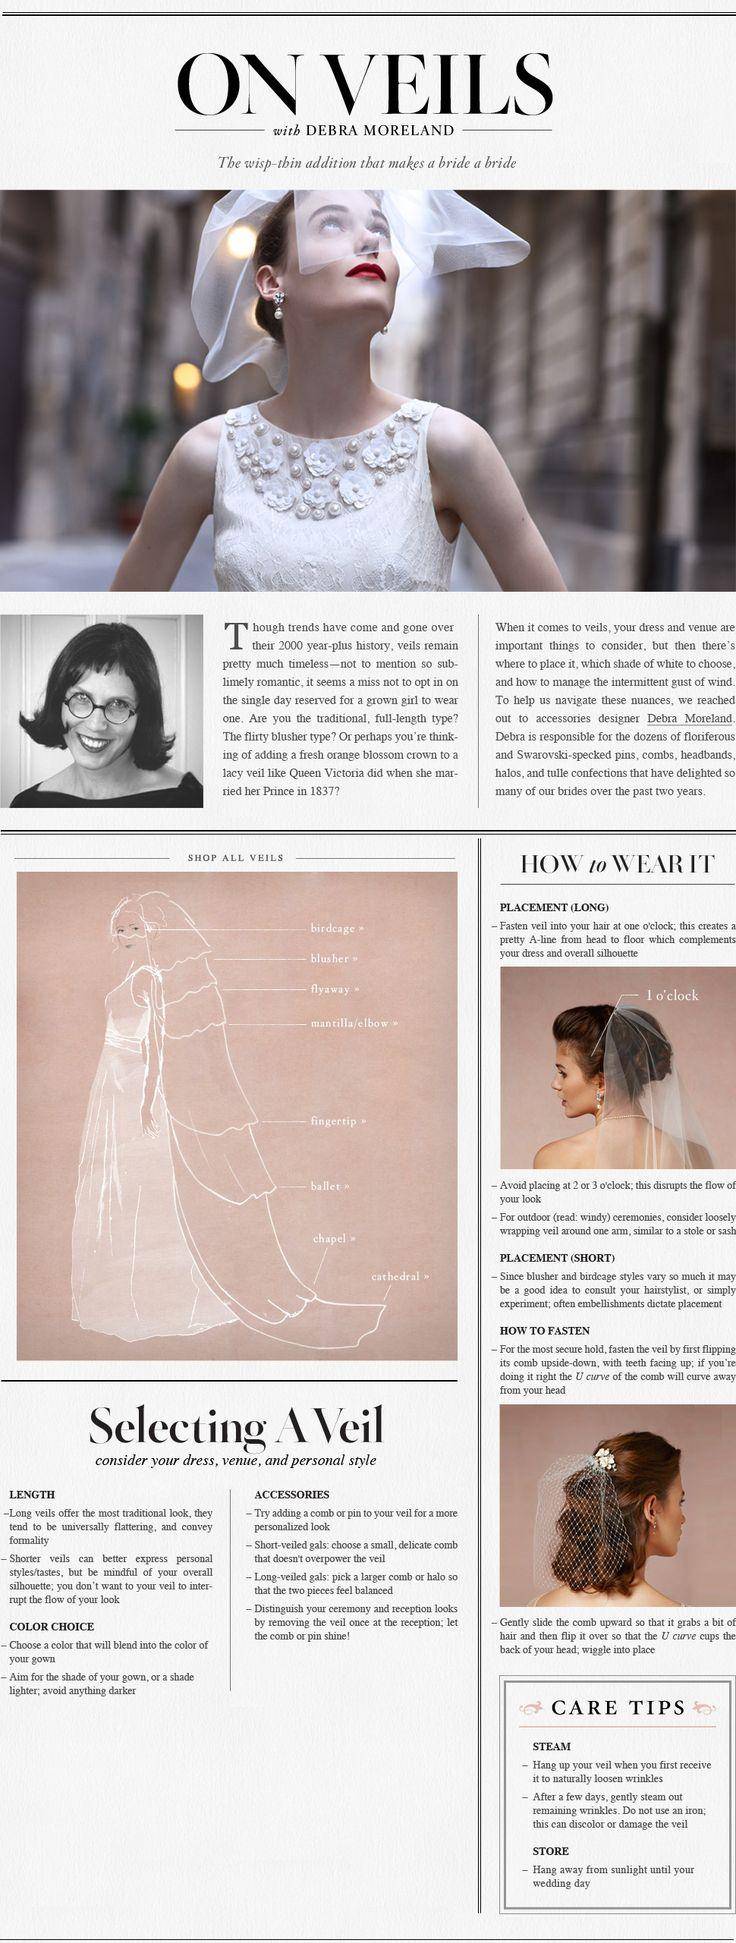 On Veils | B-Inspired | BHLDN  http://www.bhldn.com/b-inspired/b-inspired-dressing/on-veils?cm_mmc=broadcast-_-Q12013-_-20130322_veils-_-bins#